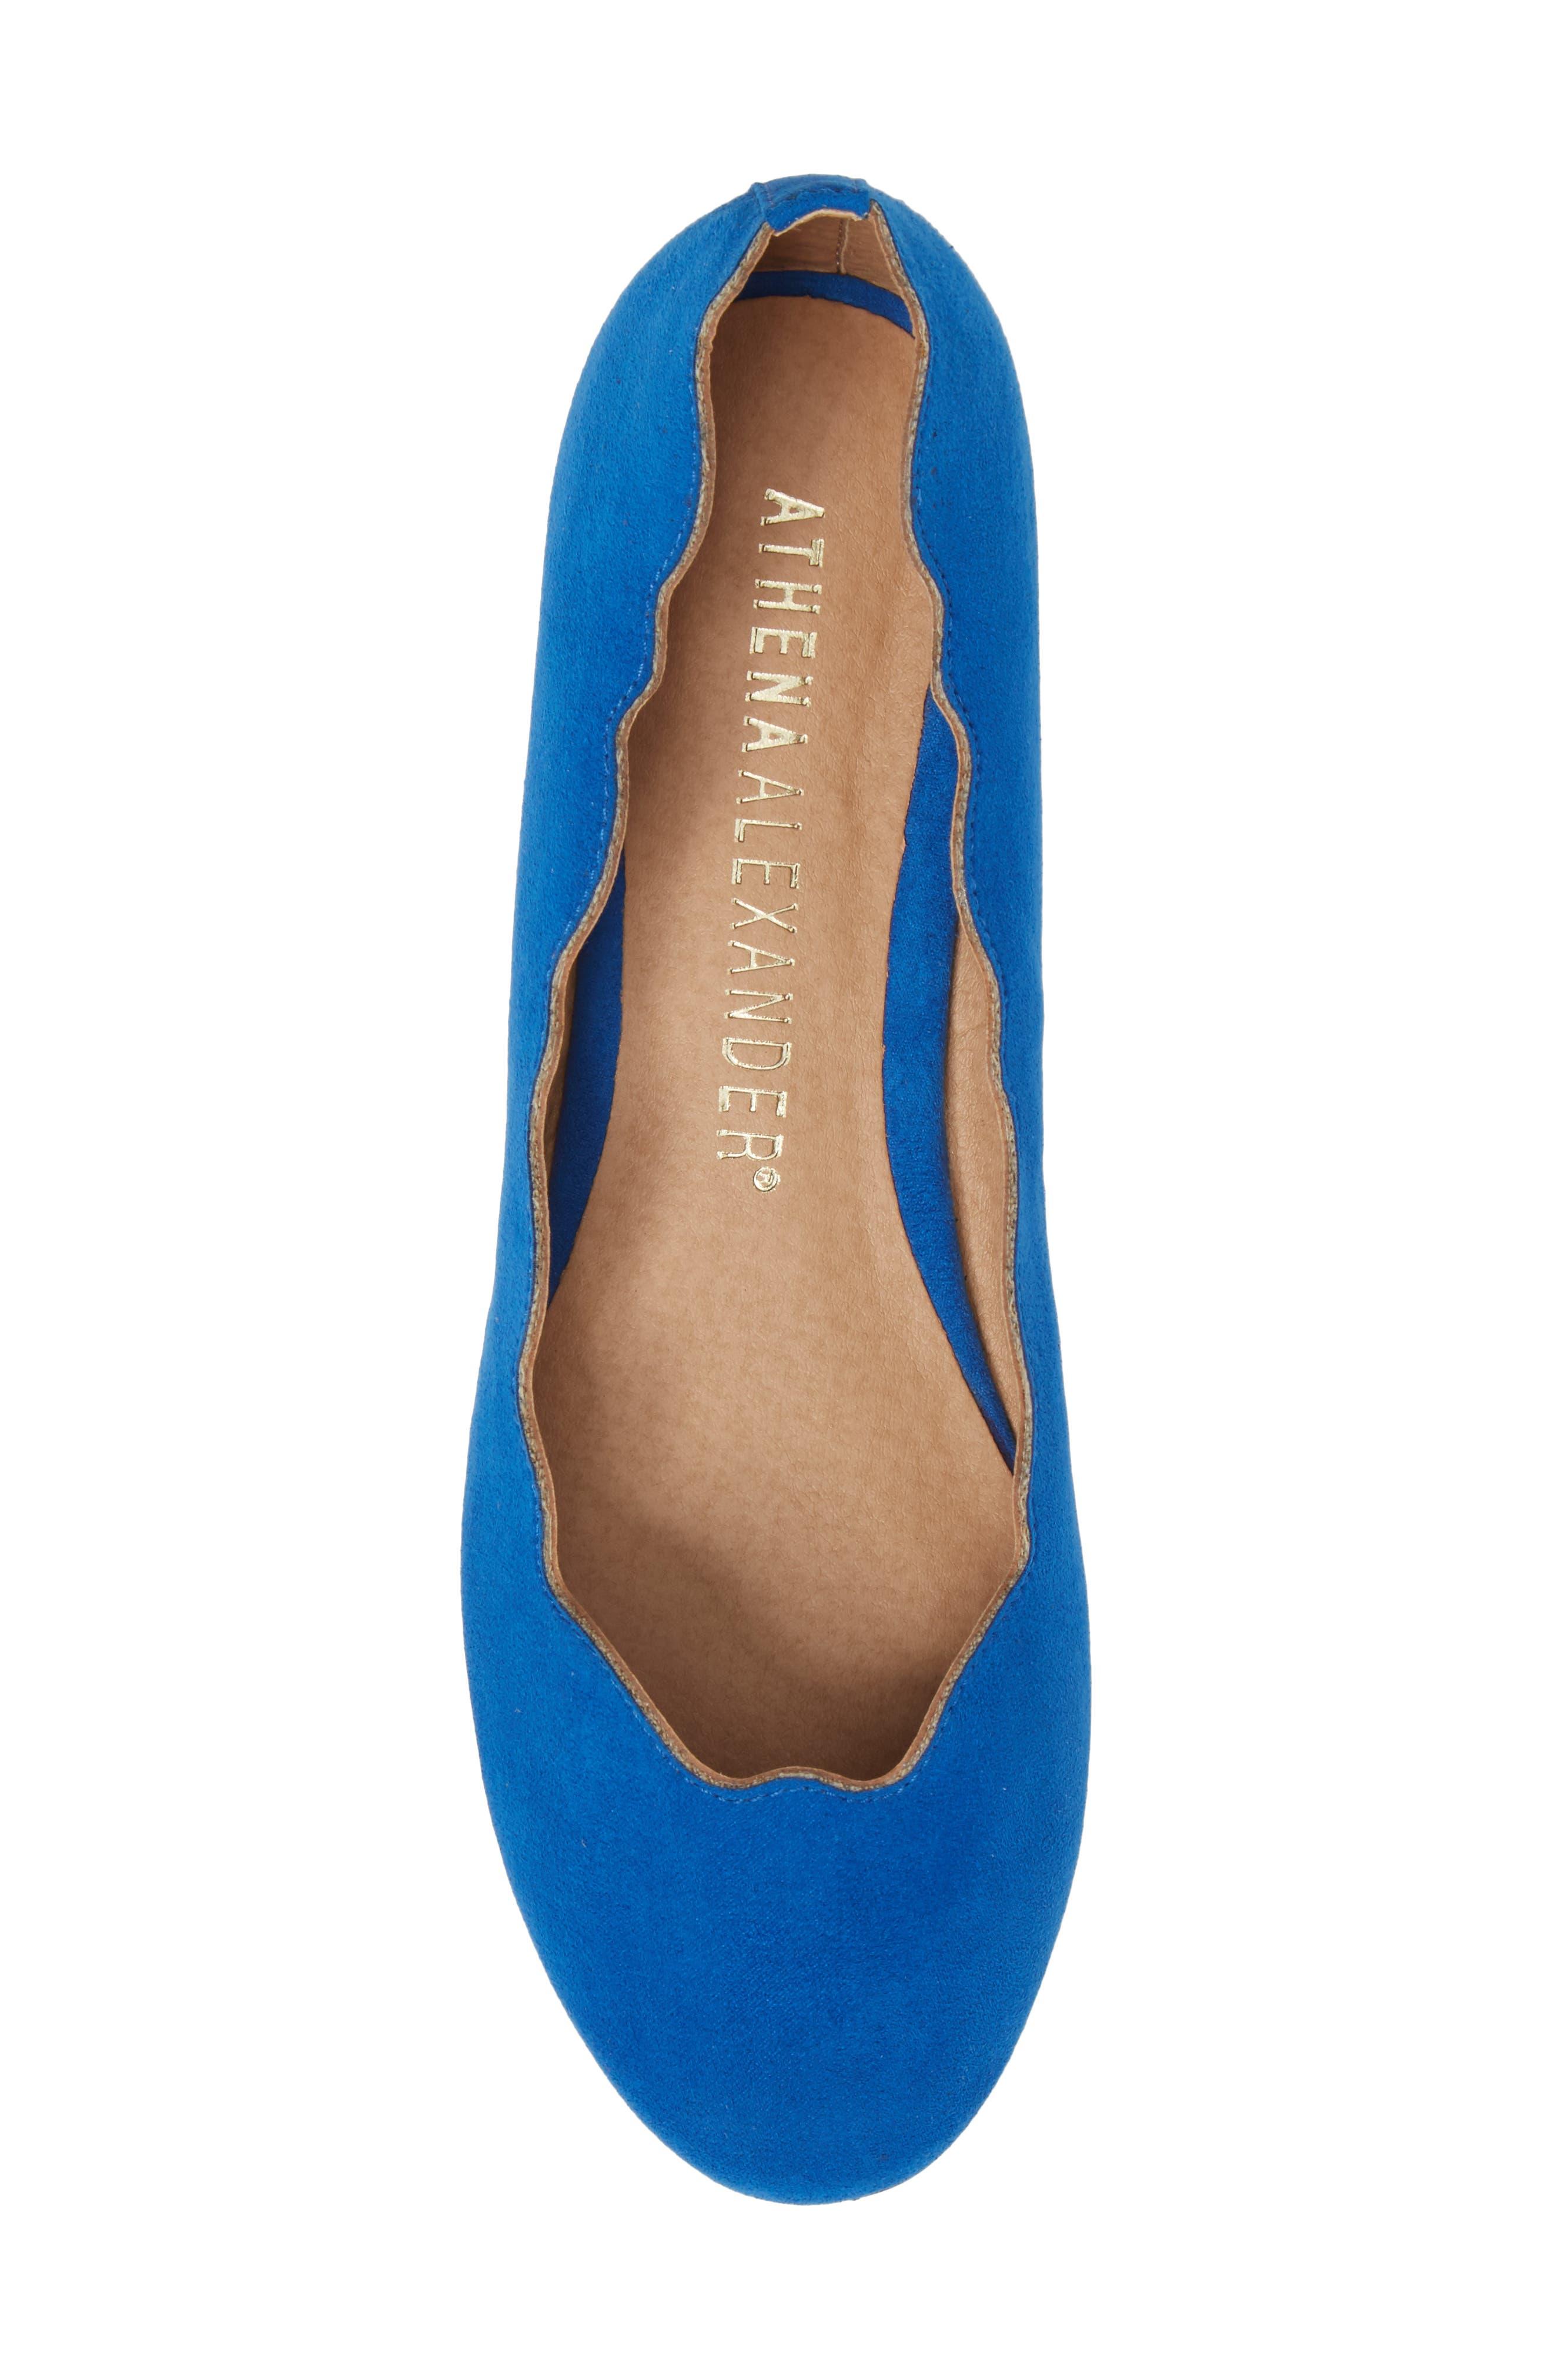 Tallye Ballet Flat,                             Alternate thumbnail 5, color,                             Royal Blue Faux Suede